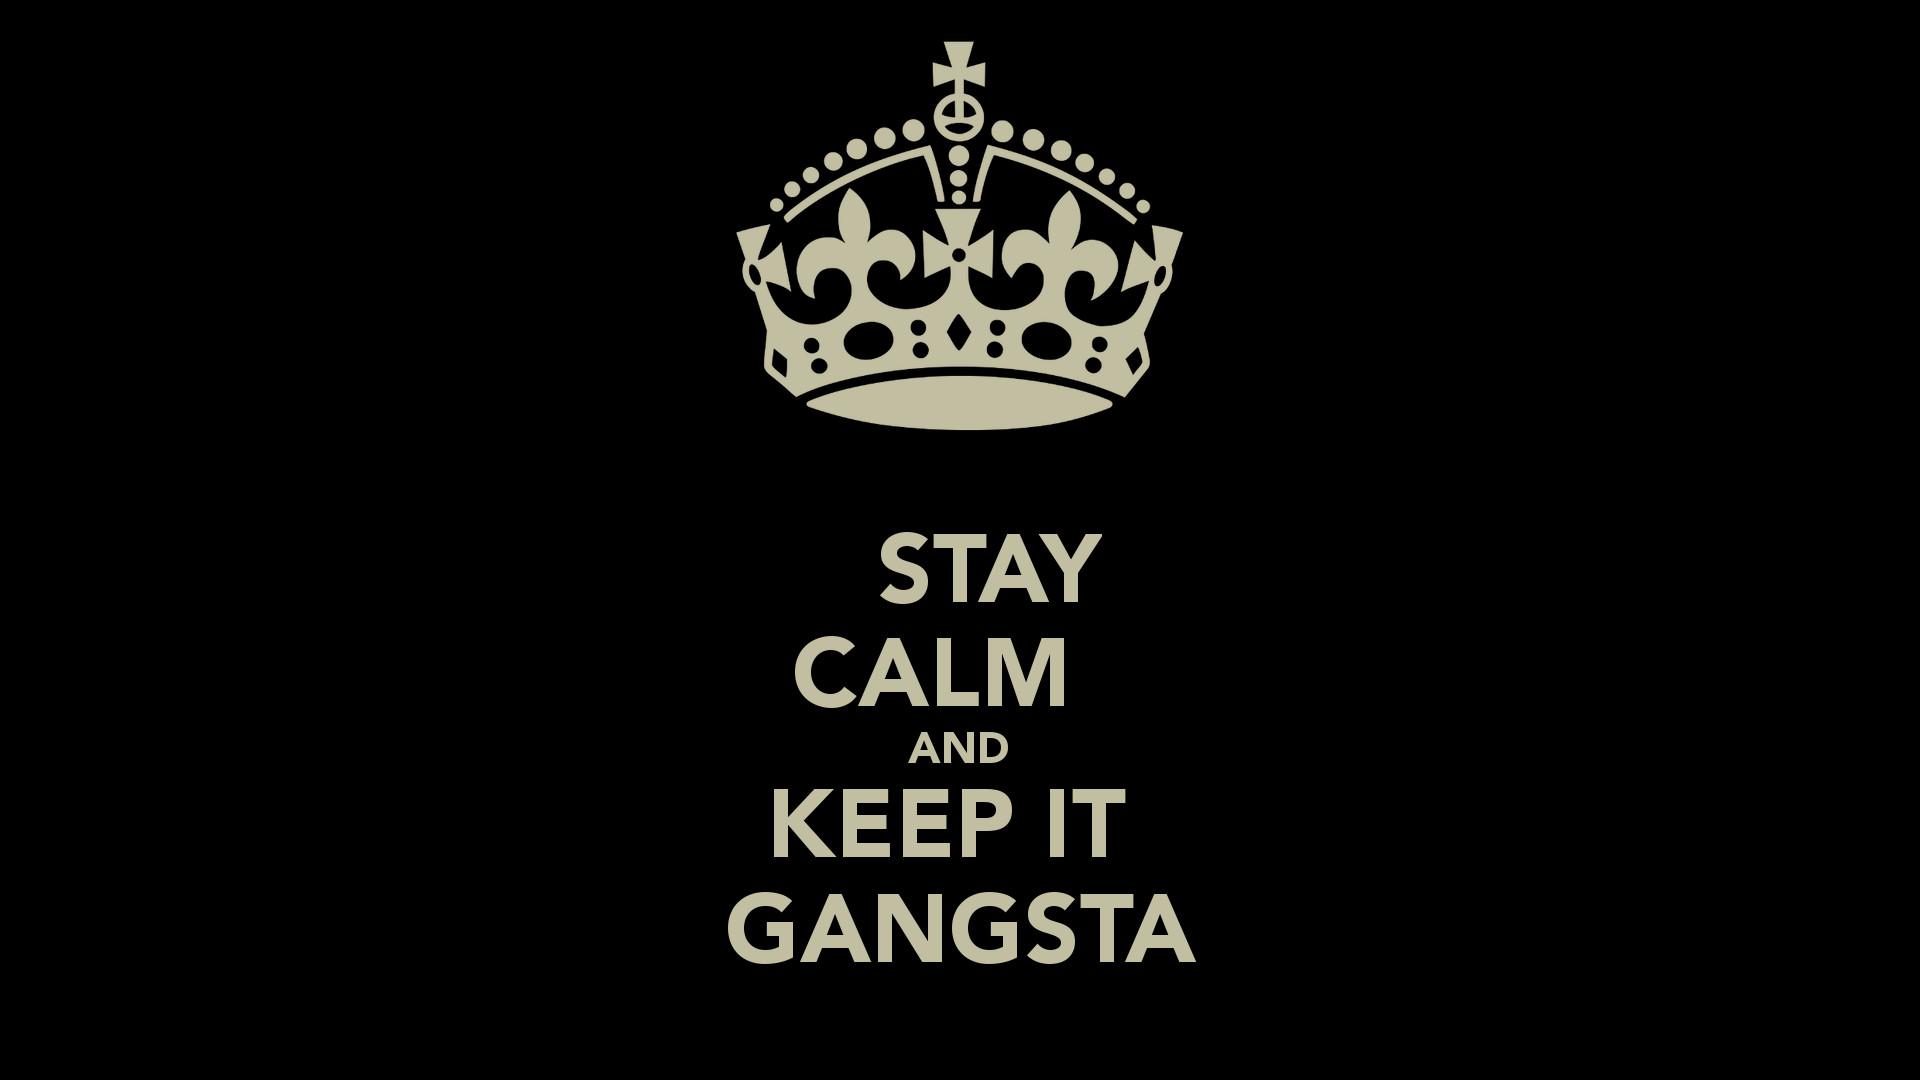 Gangsta Wallpapers – Wallpaper Cave